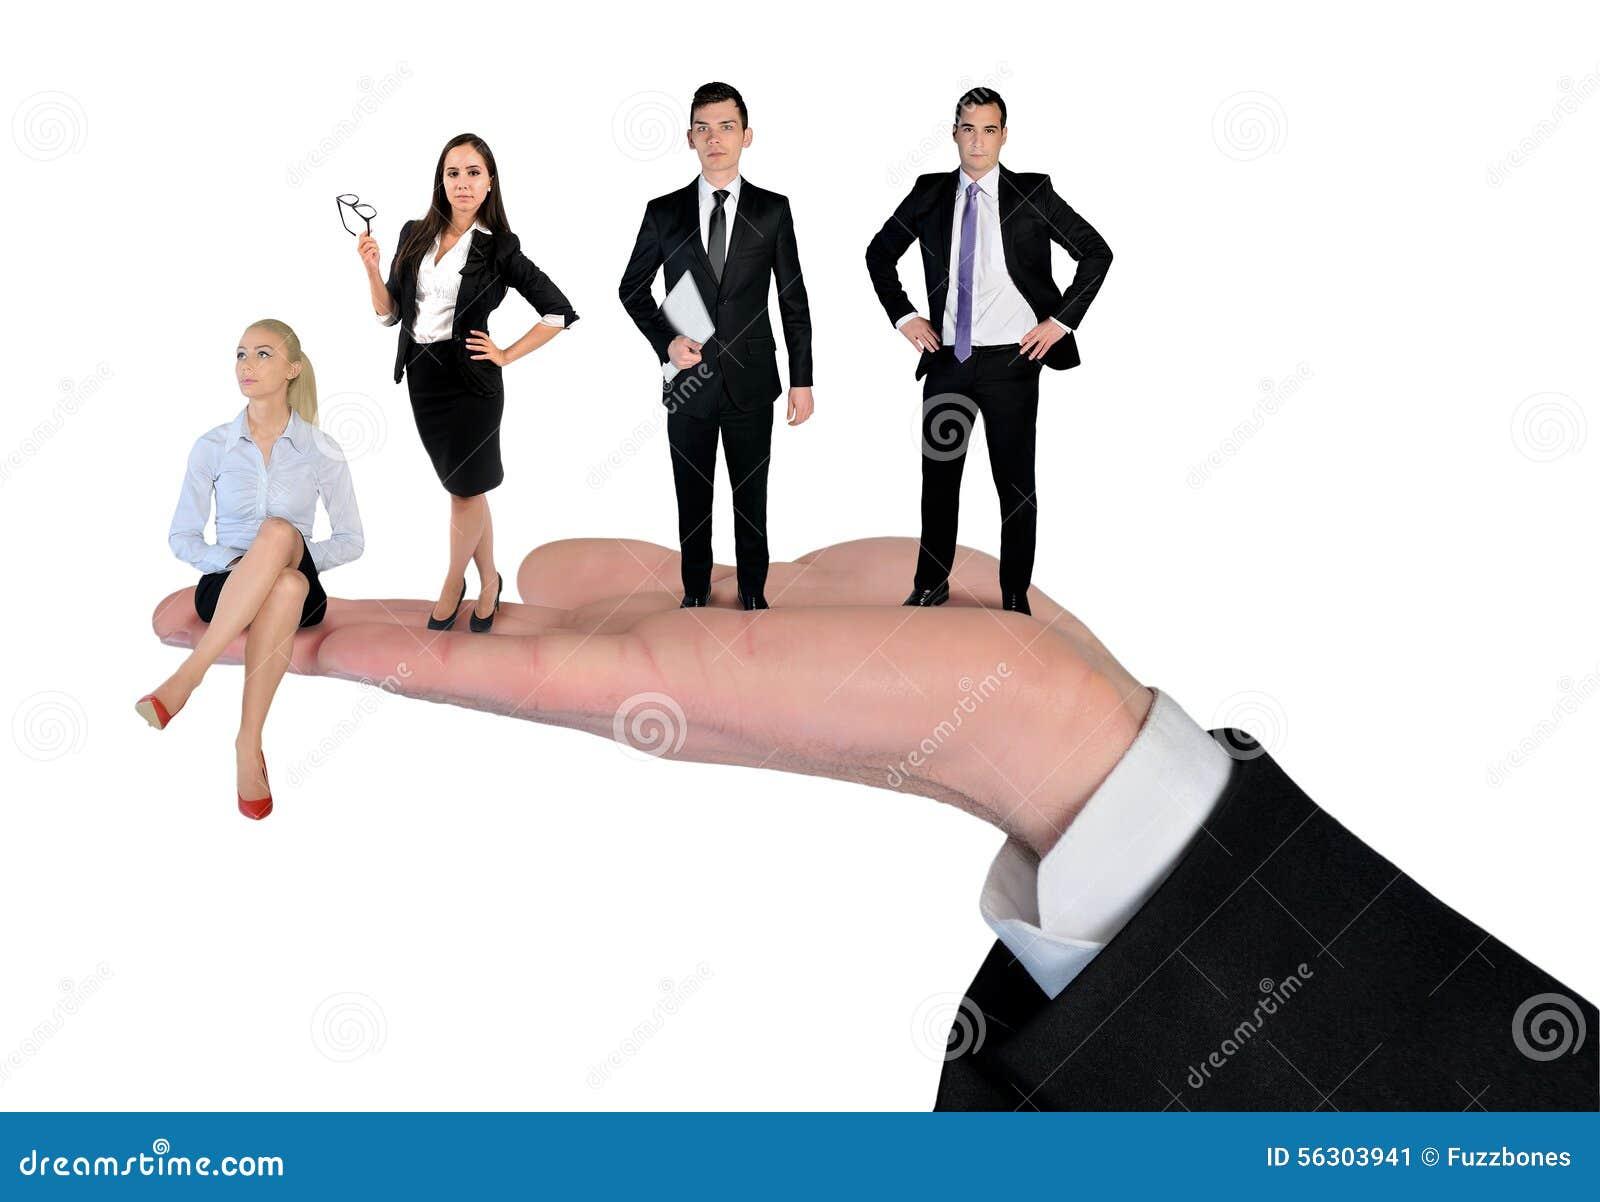 Businessteam isolated